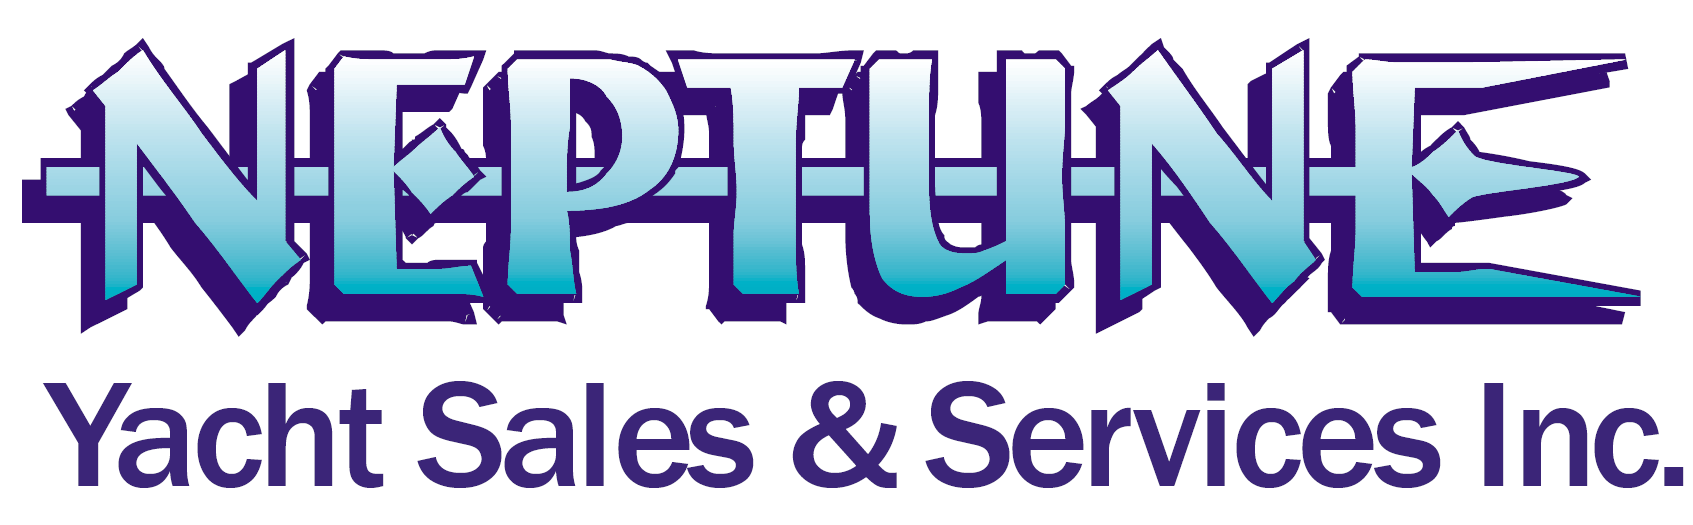 neptuneyachtsales.com logo